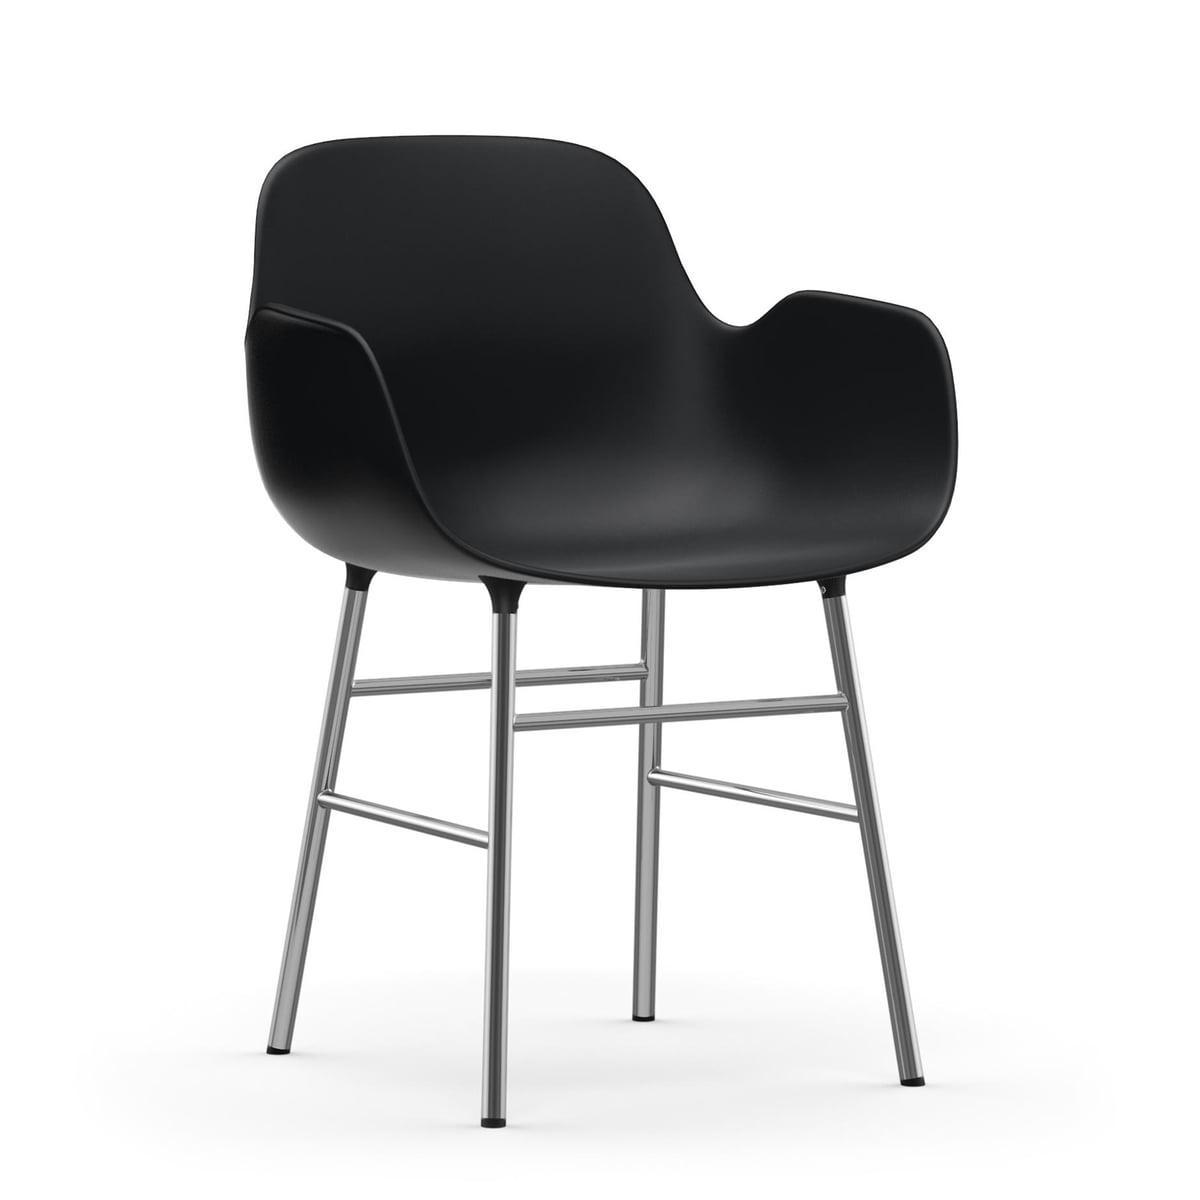 chrom stuhl form von normann copenhagen. Black Bedroom Furniture Sets. Home Design Ideas